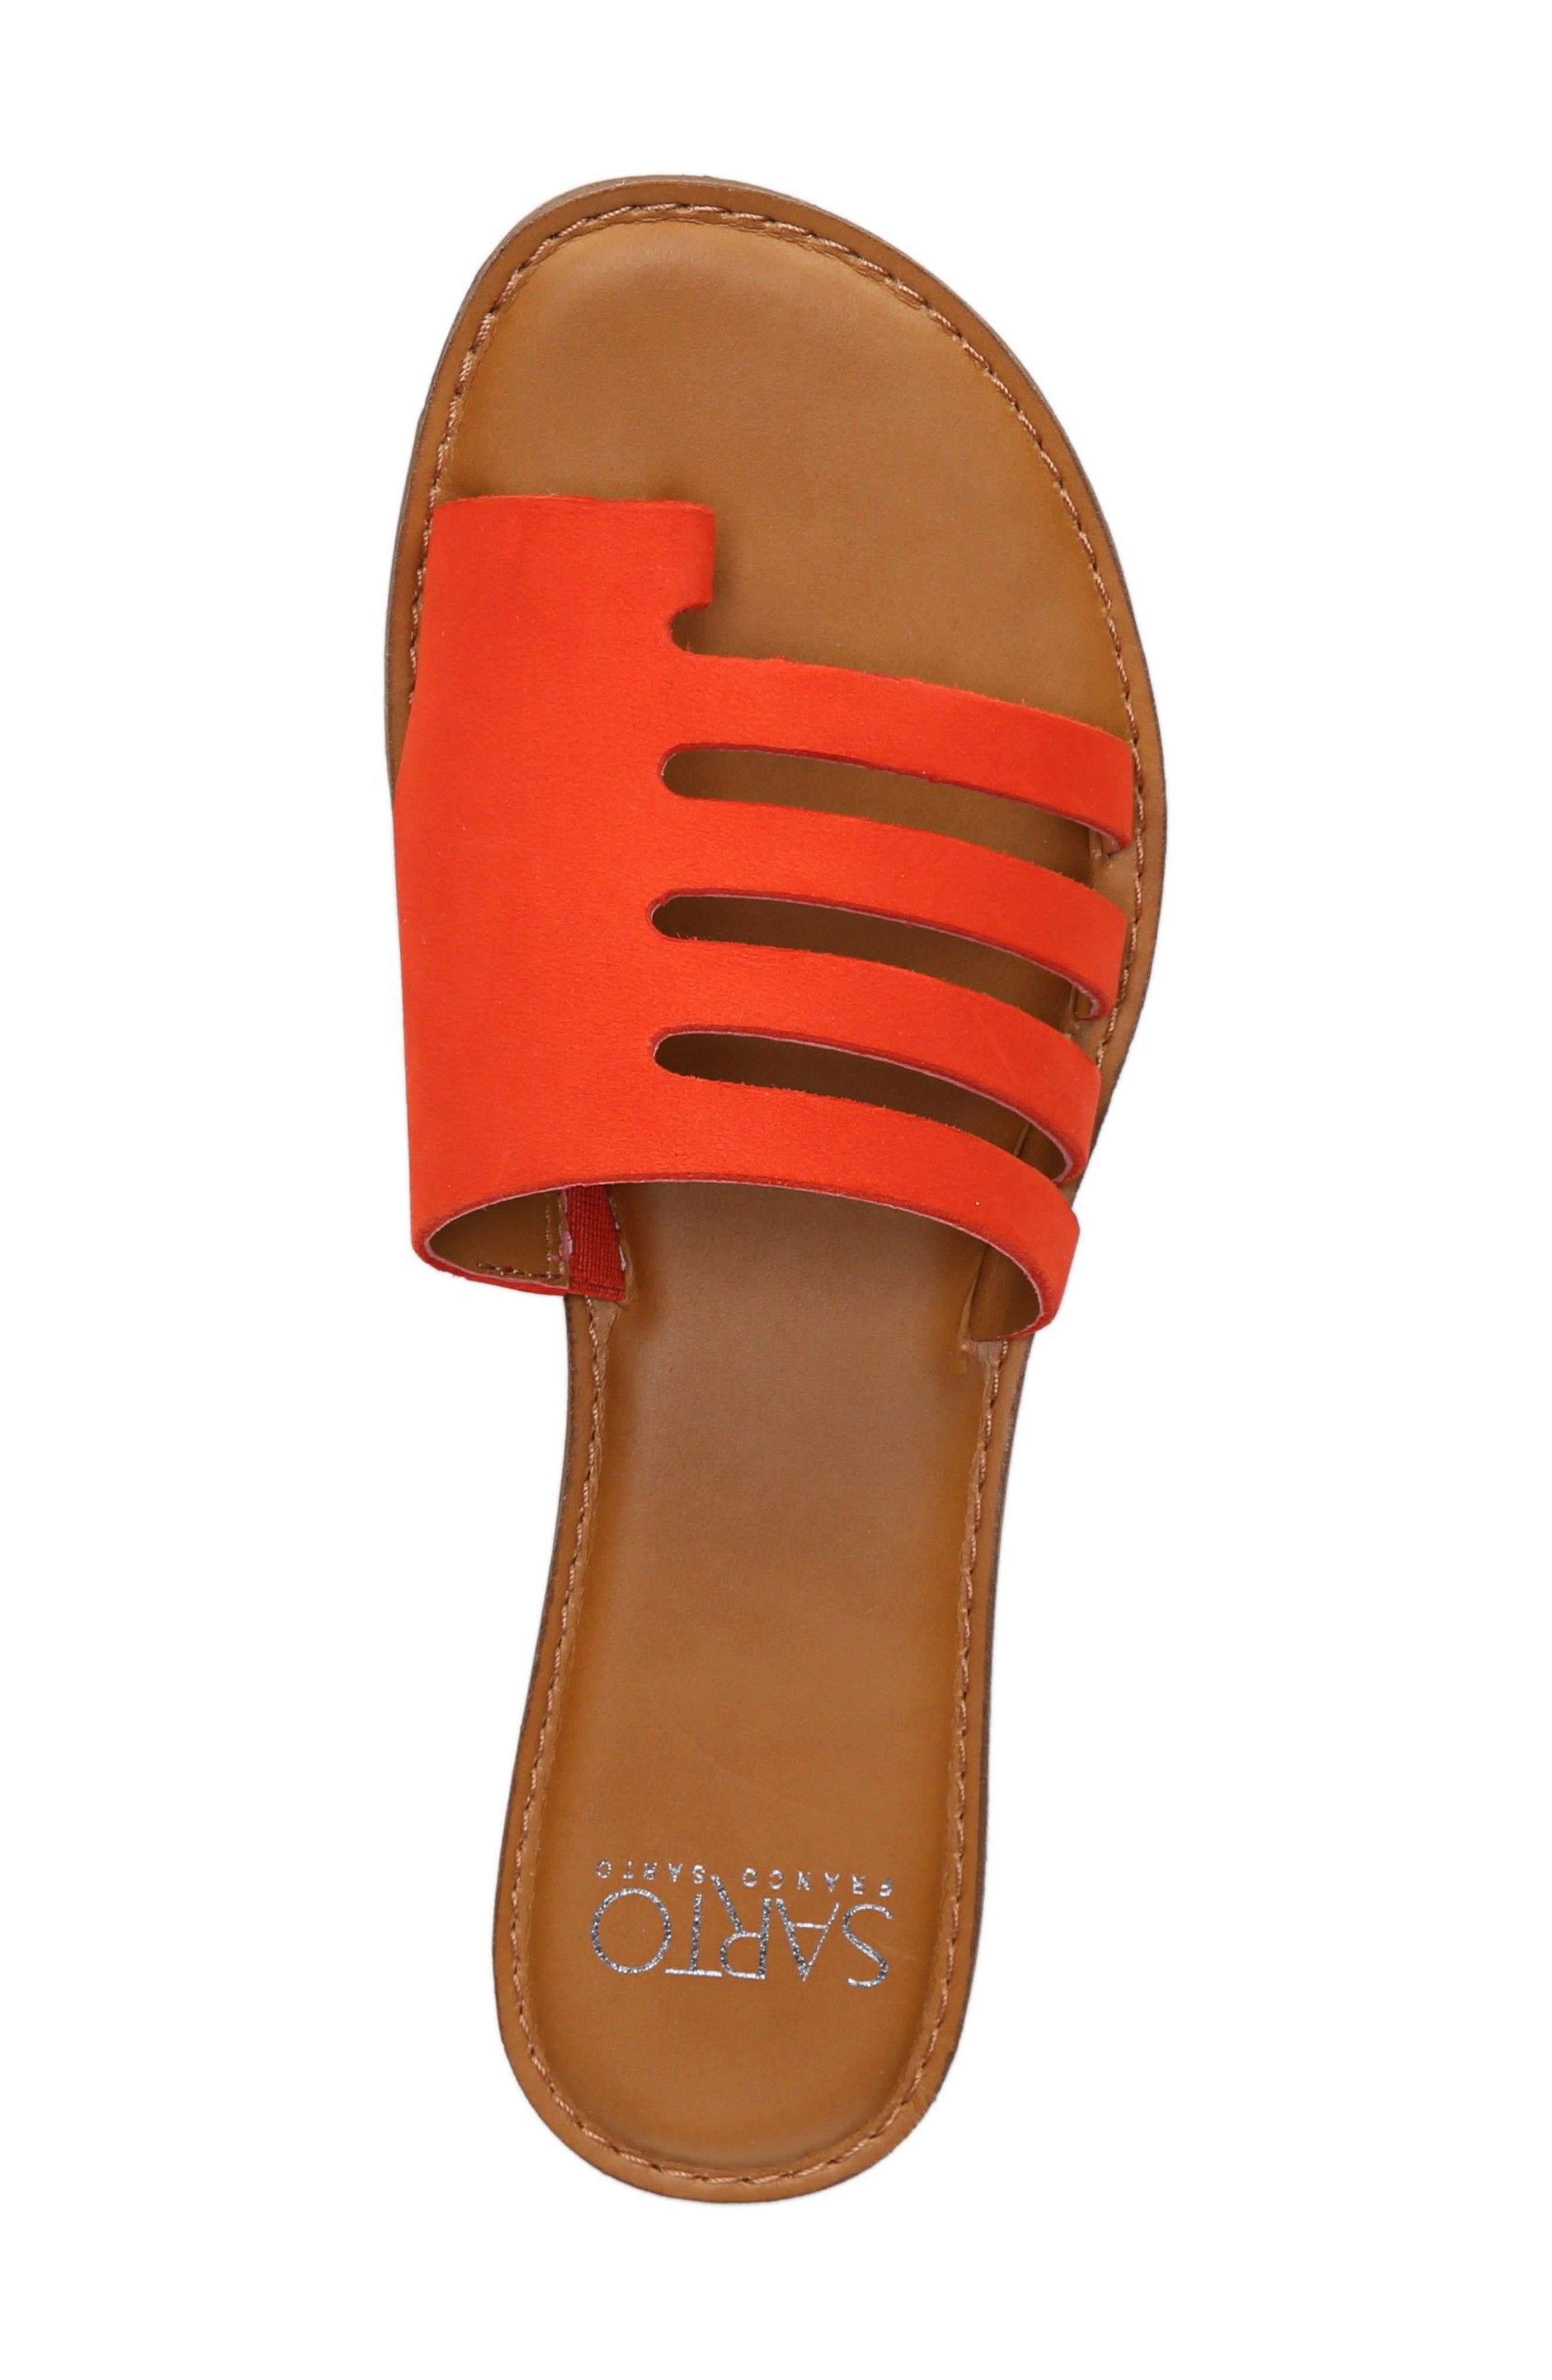 Alternate Image 3  - SARTO by Franco Sarto Gala Slide Sandal (Women)